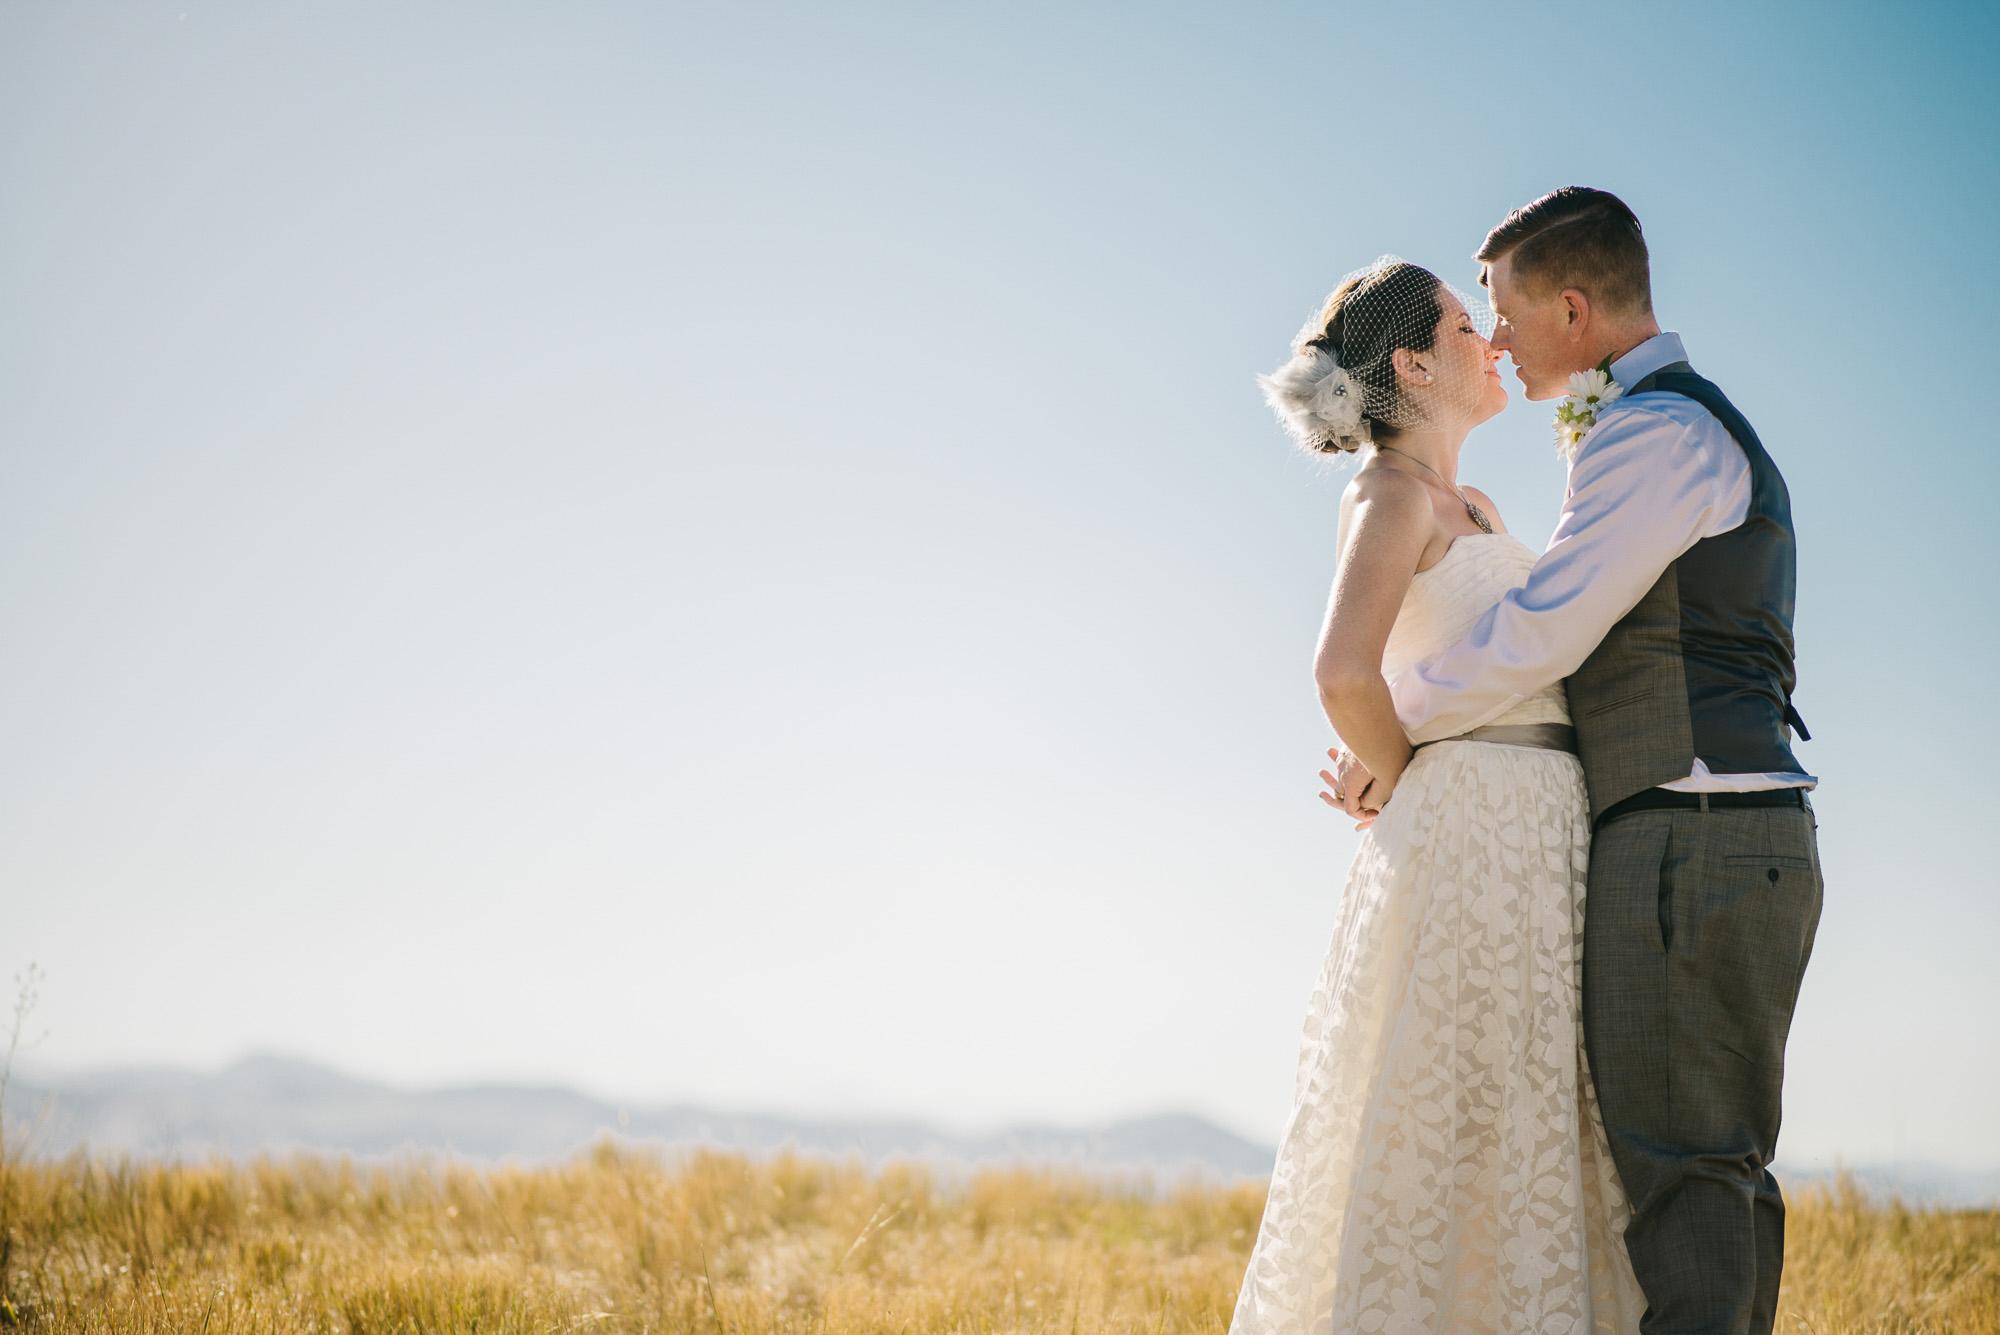 40elopement-photographer-colorado-April&TJ-Wedding_Jackass-Hill_wedding-1706.jpg